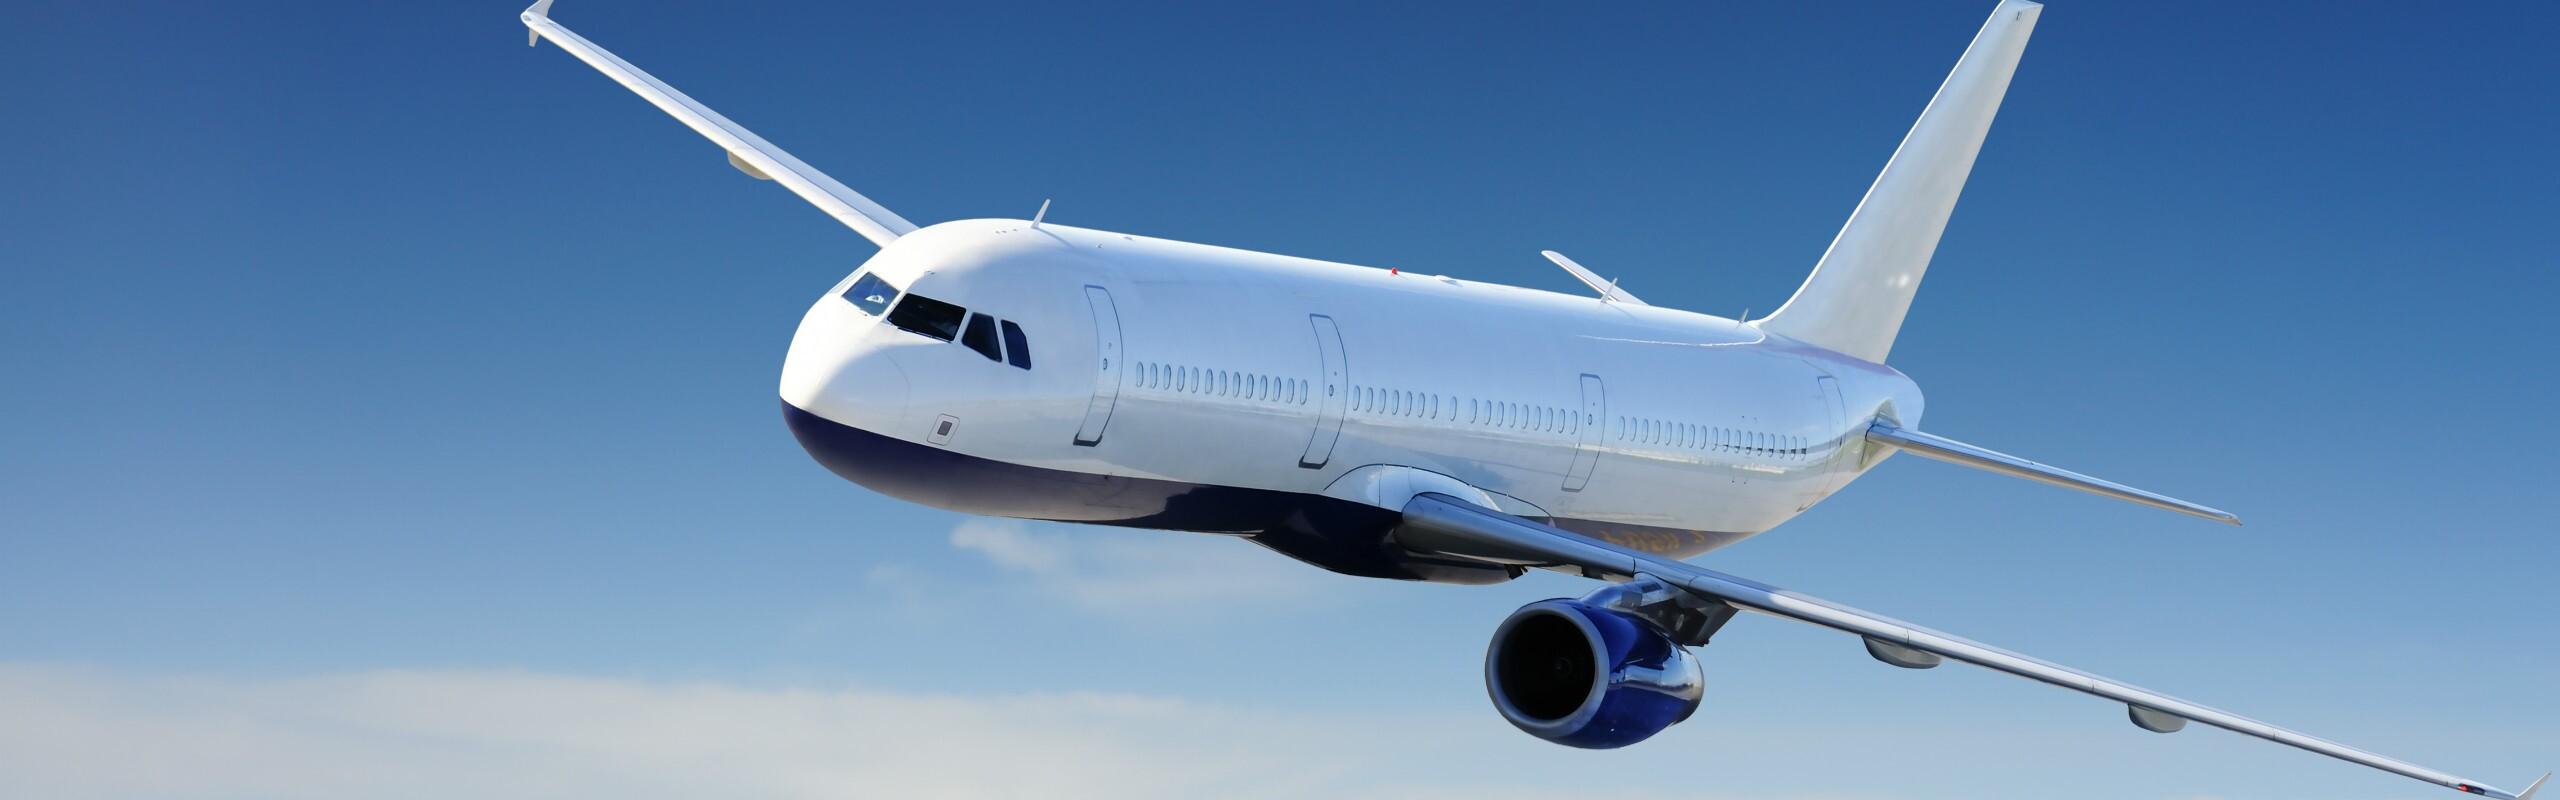 Choosing Flights from the USA to Vietnam